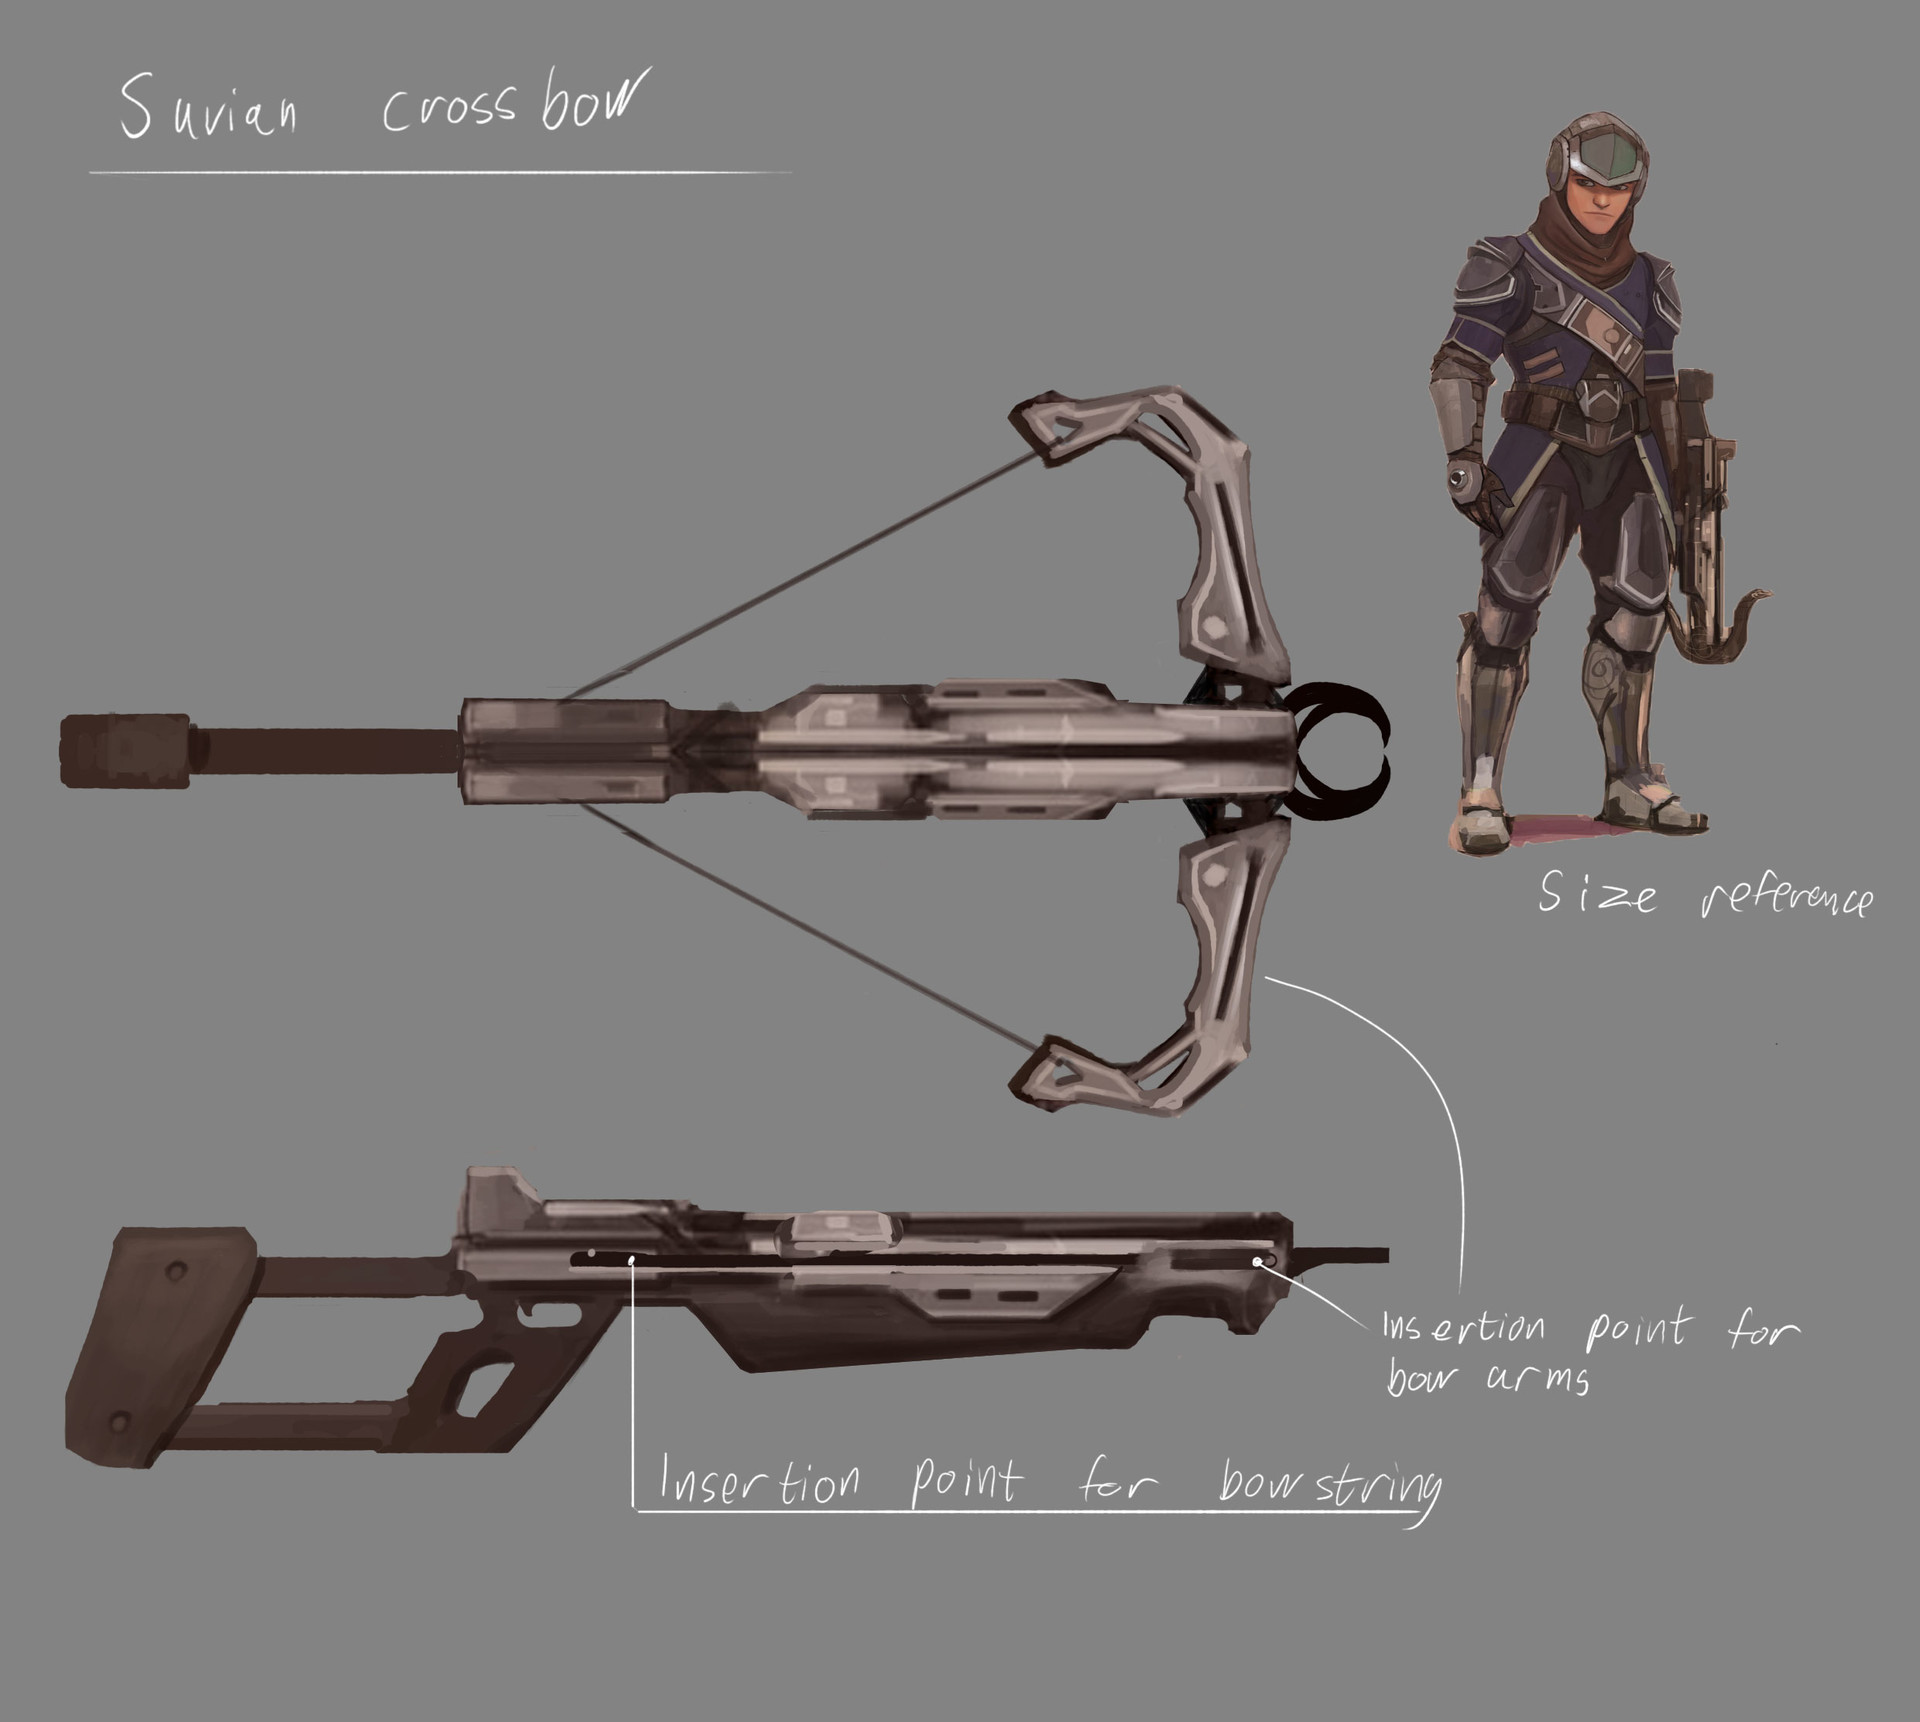 Fredrik dahl conceptart weapon suviancrossbow